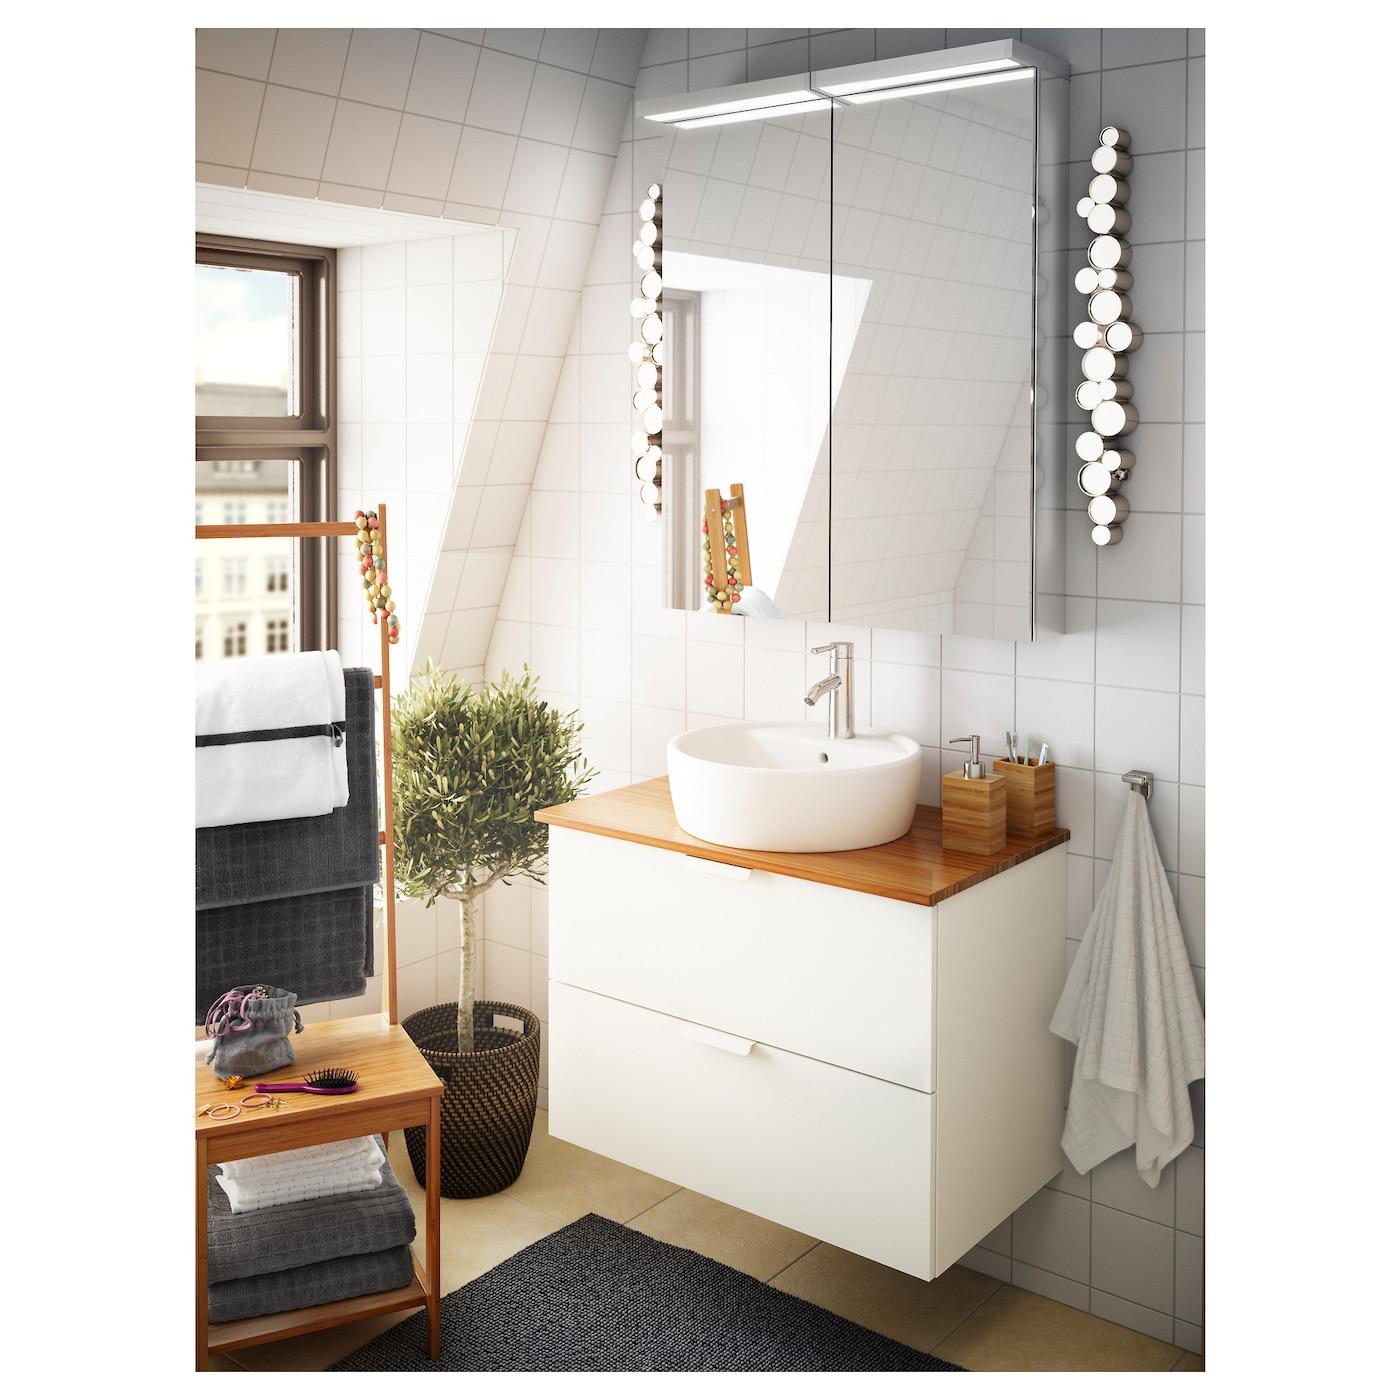 Bamboo countertops bathroom - Ikea Tolken Countertop You Can Place The Wash Basin Where You Prefer Left